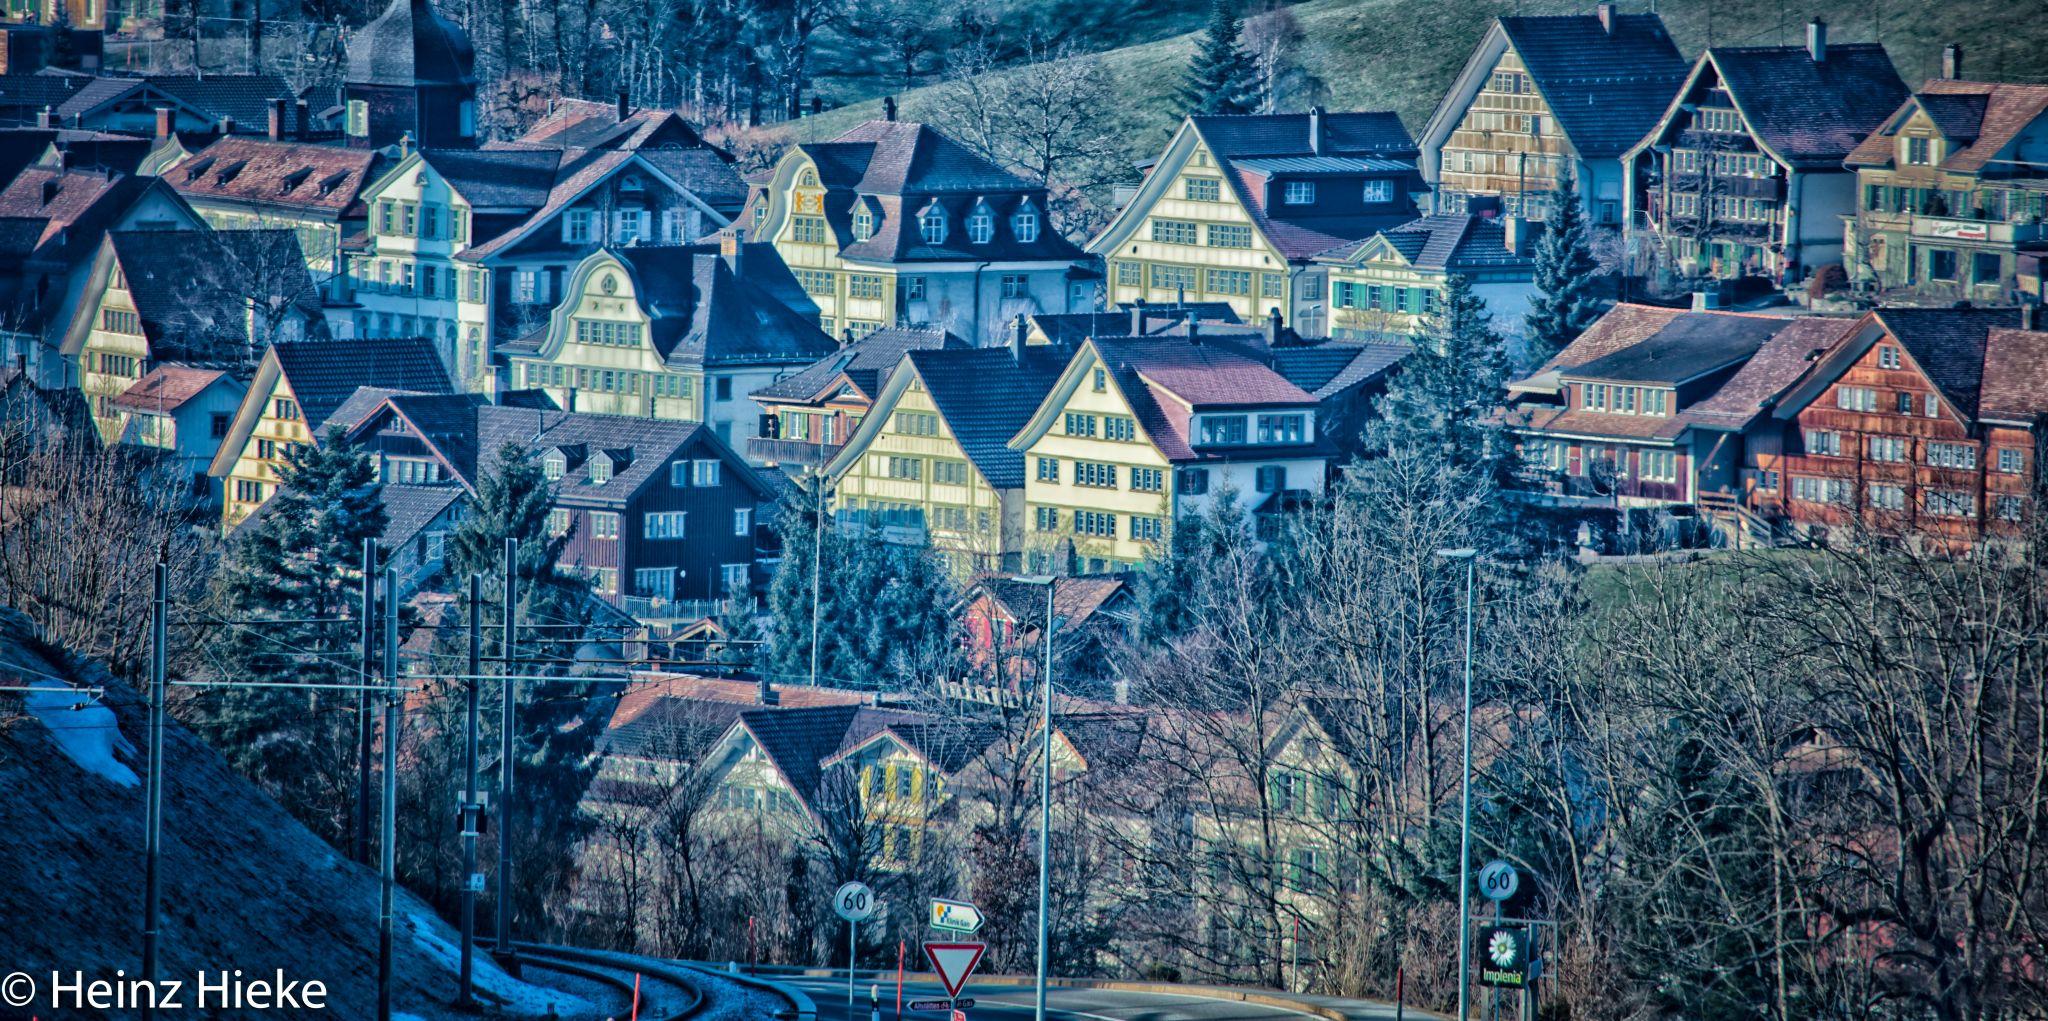 Gais, Switzerland